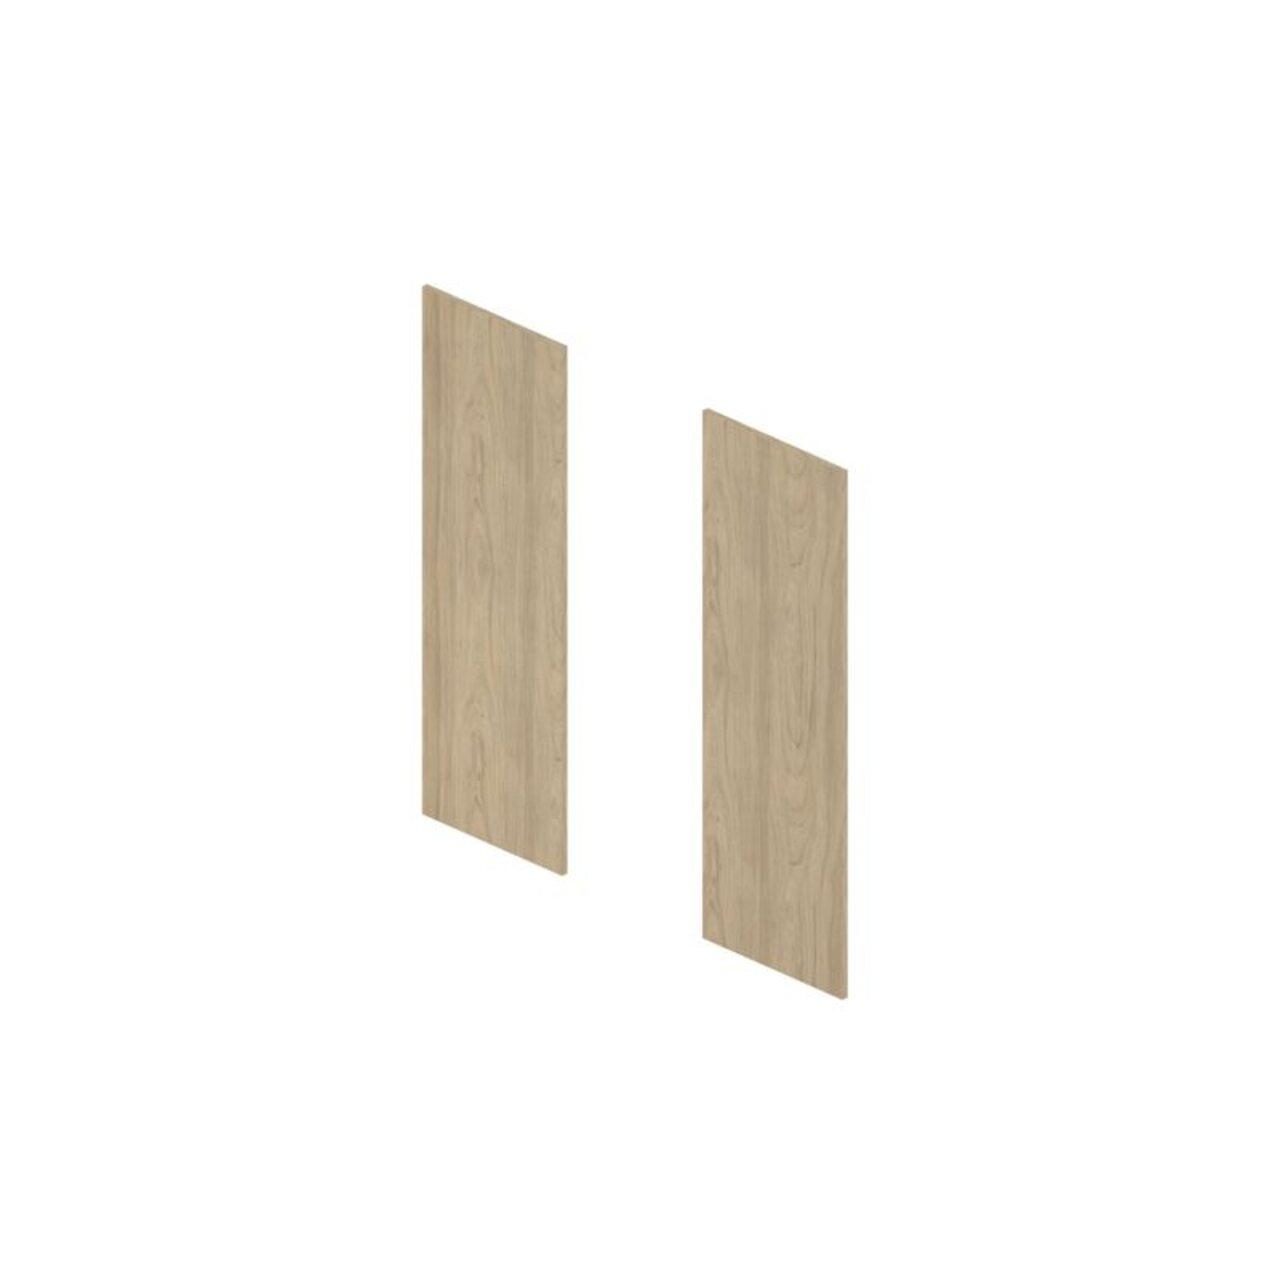 Раздвижные двери для стеллажа R-81  Rio 143x3x144 - фото 1